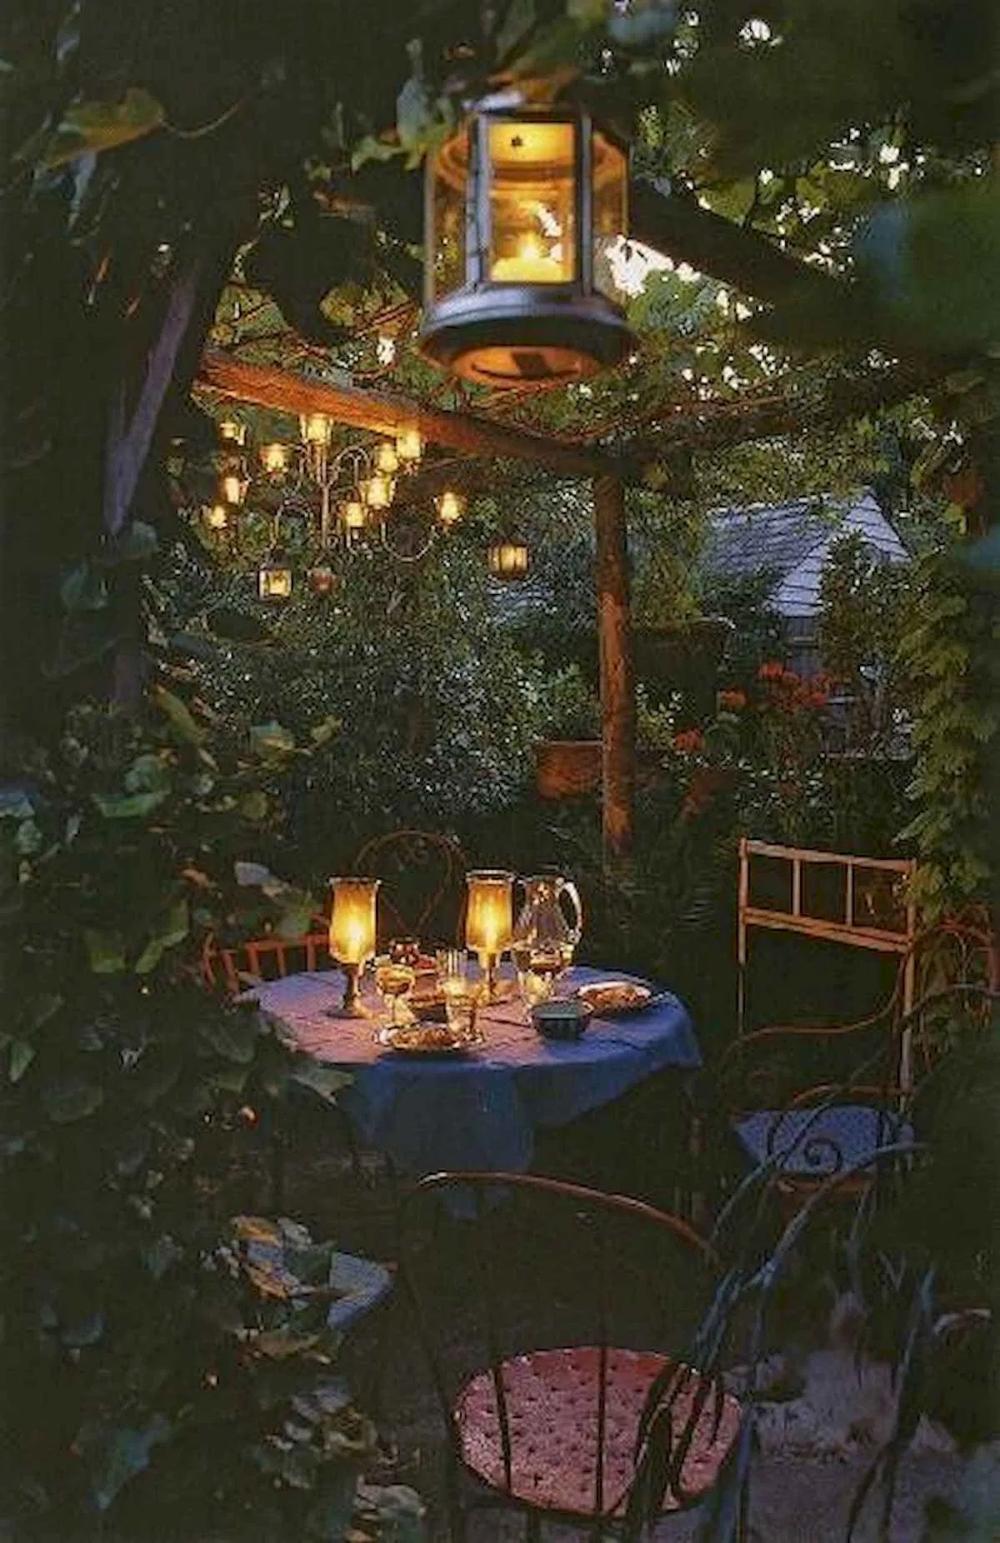 40 Awesome Secret Garden Design Ideas For Summer (26